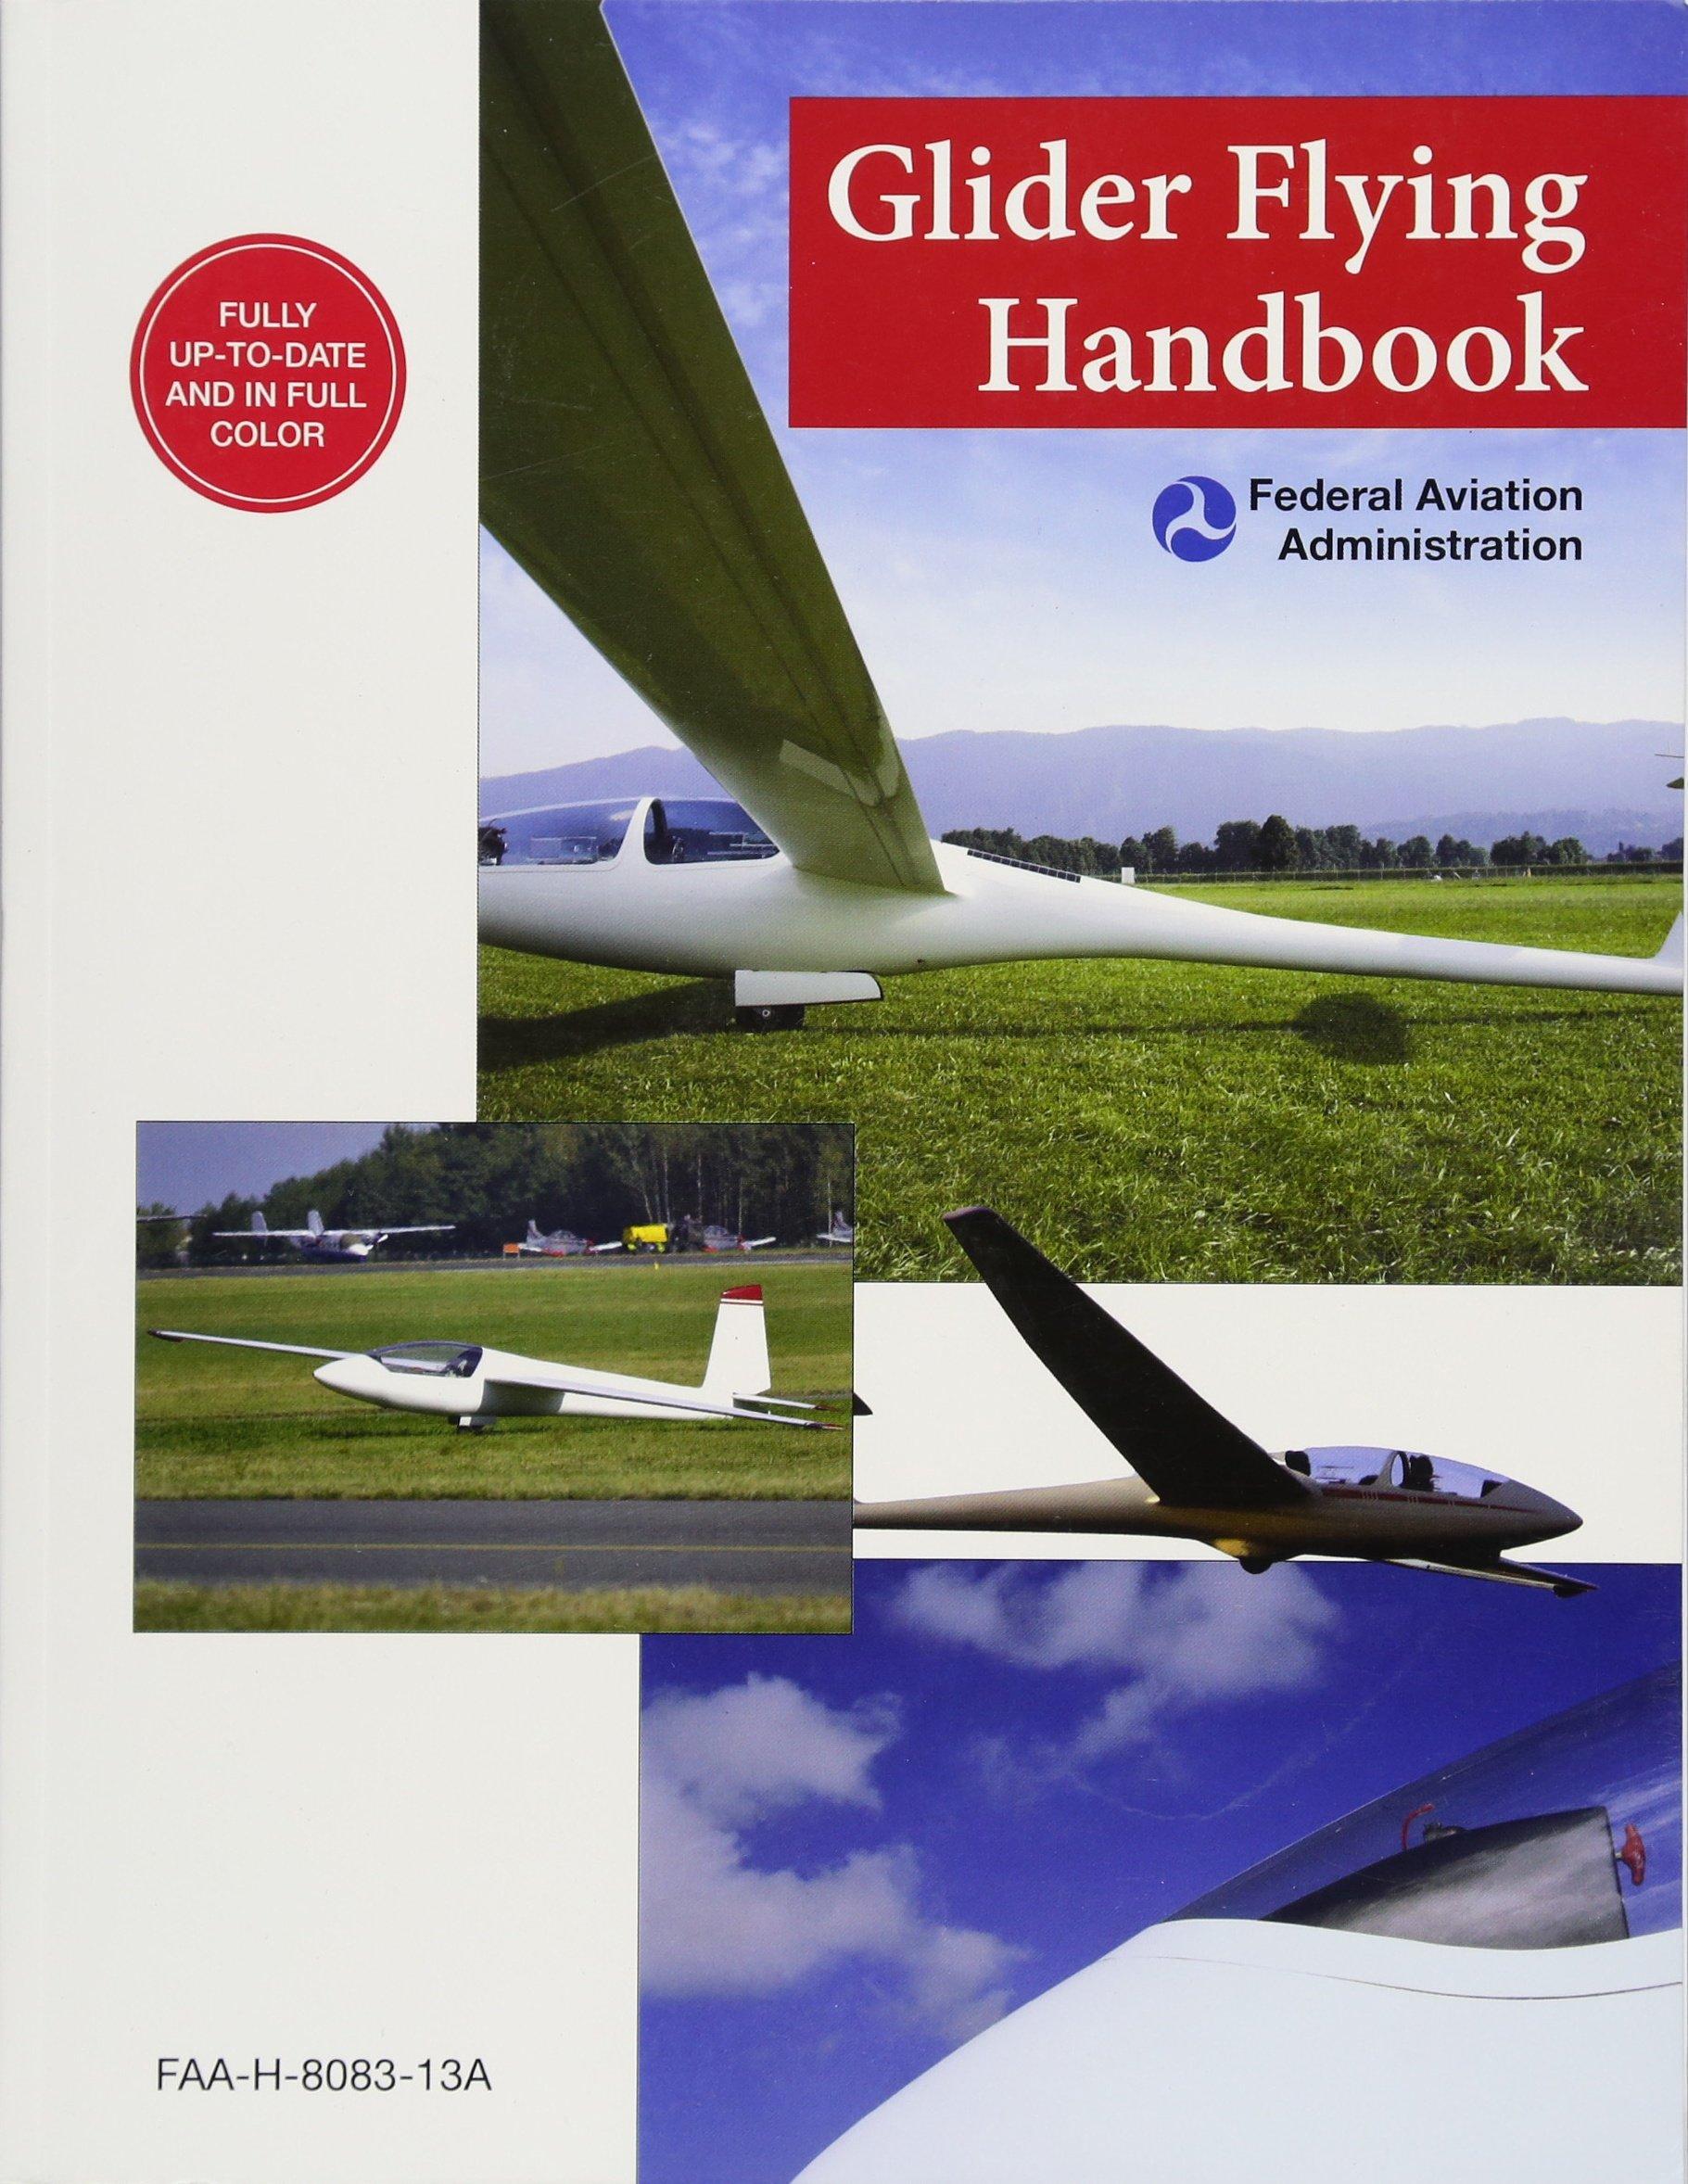 Amazon.com: Glider Flying Handbook (Federal Aviation Administration):  FAA-H-8083-13A (9781632206992): Federal Aviation Administration: Books